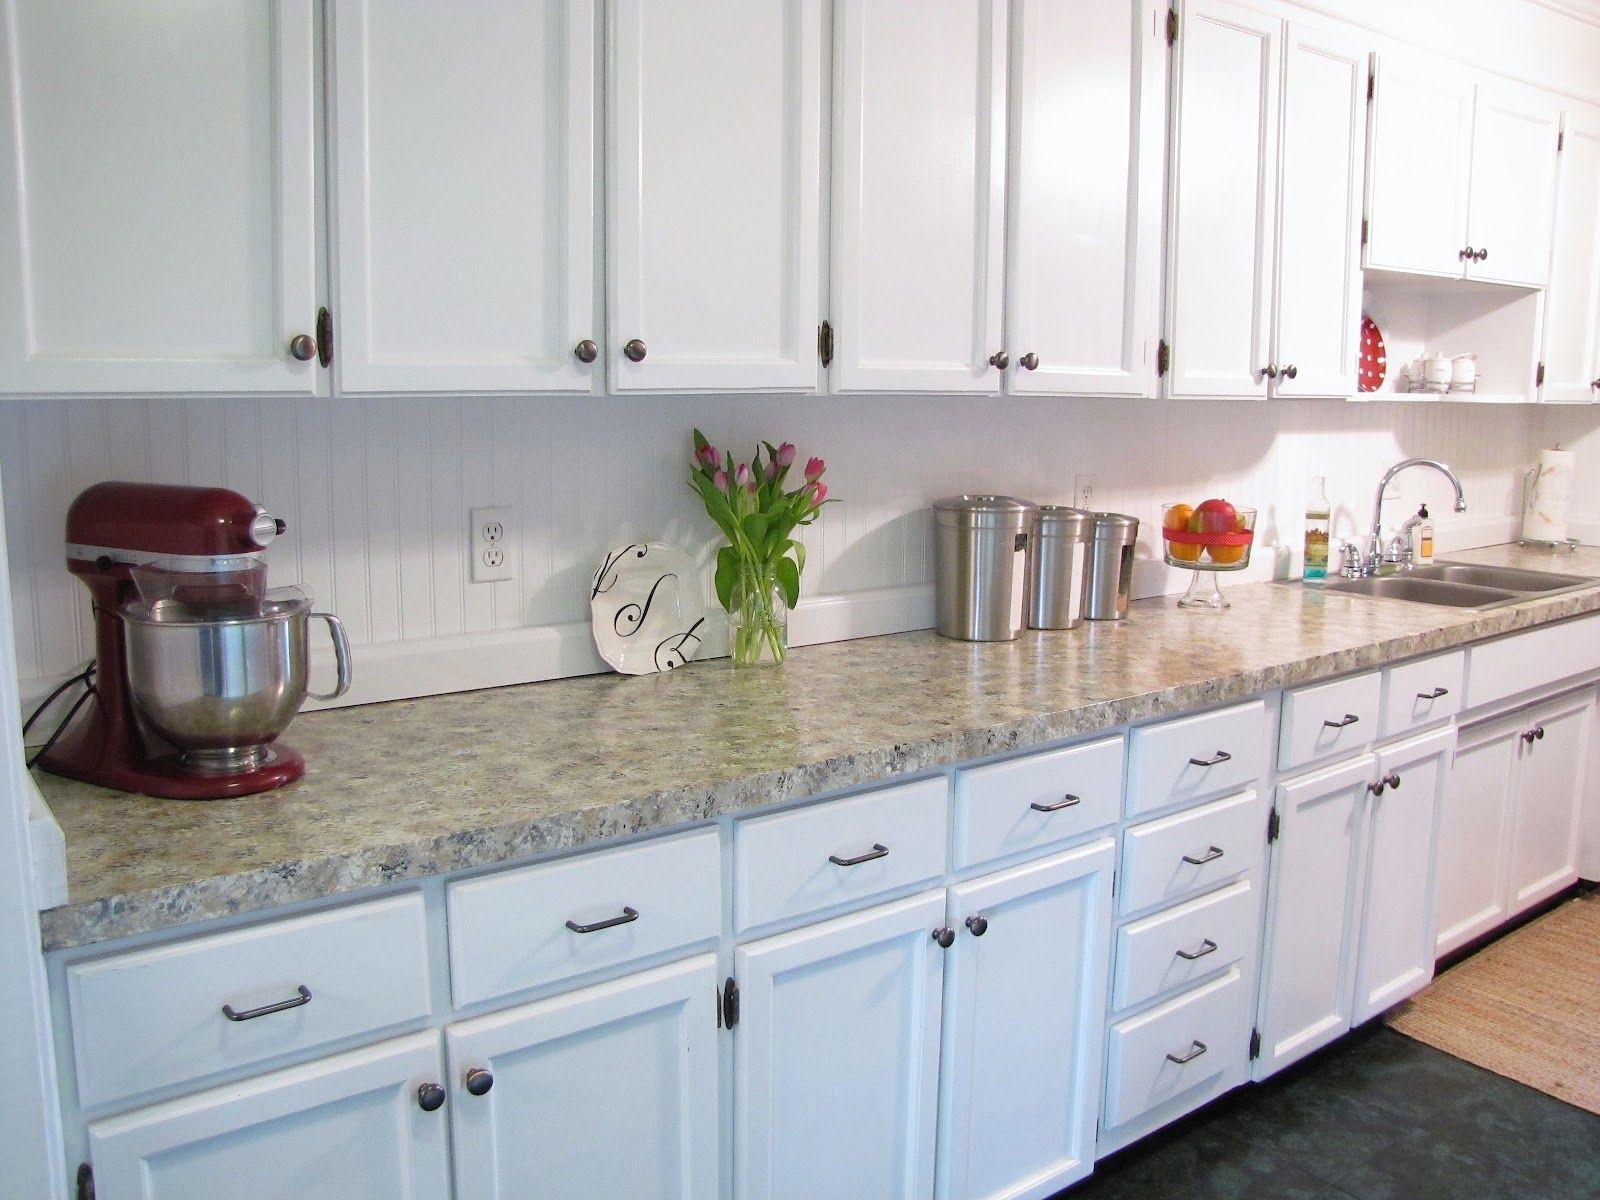 Beadboard Backsplash In Kitchen   Beadboard Kitchen Cabinets Beadboard Backsplash I Put Up In